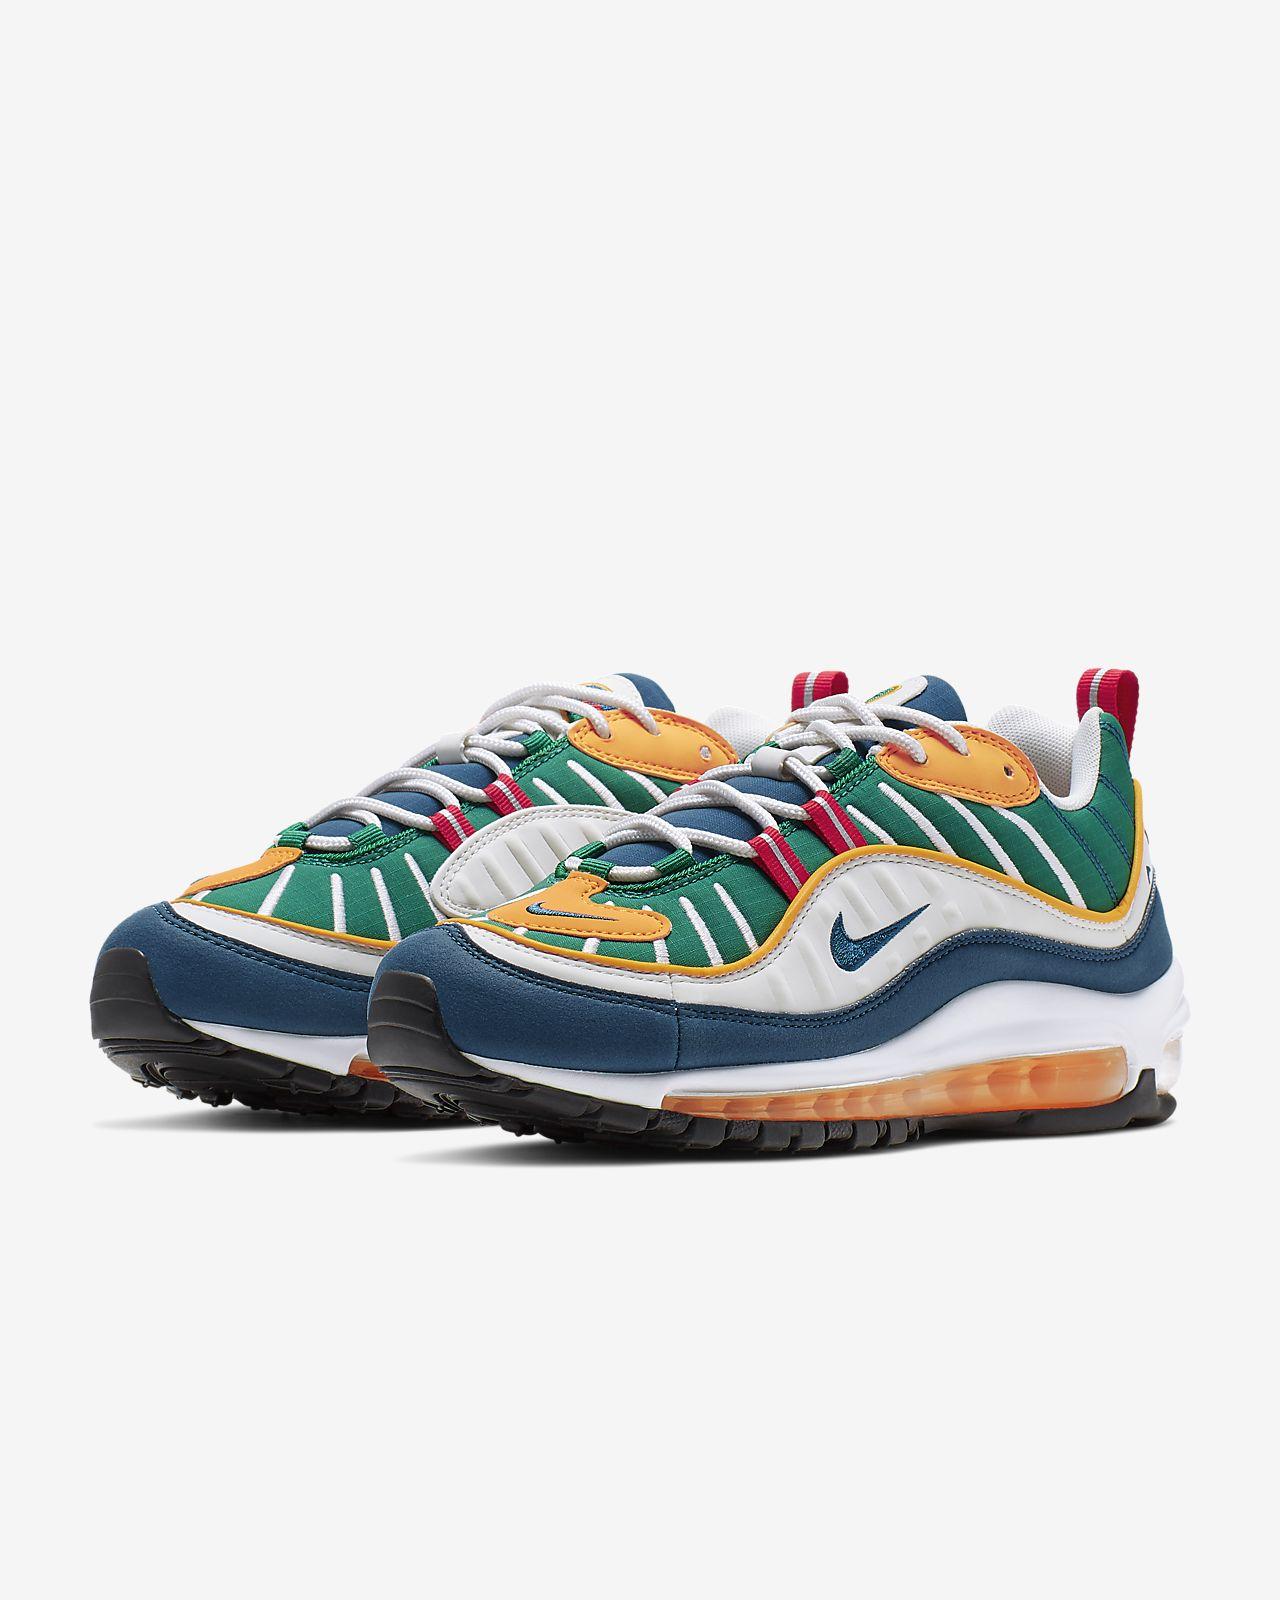 babd3137c5b Nike Air Max 98 Women's Shoe